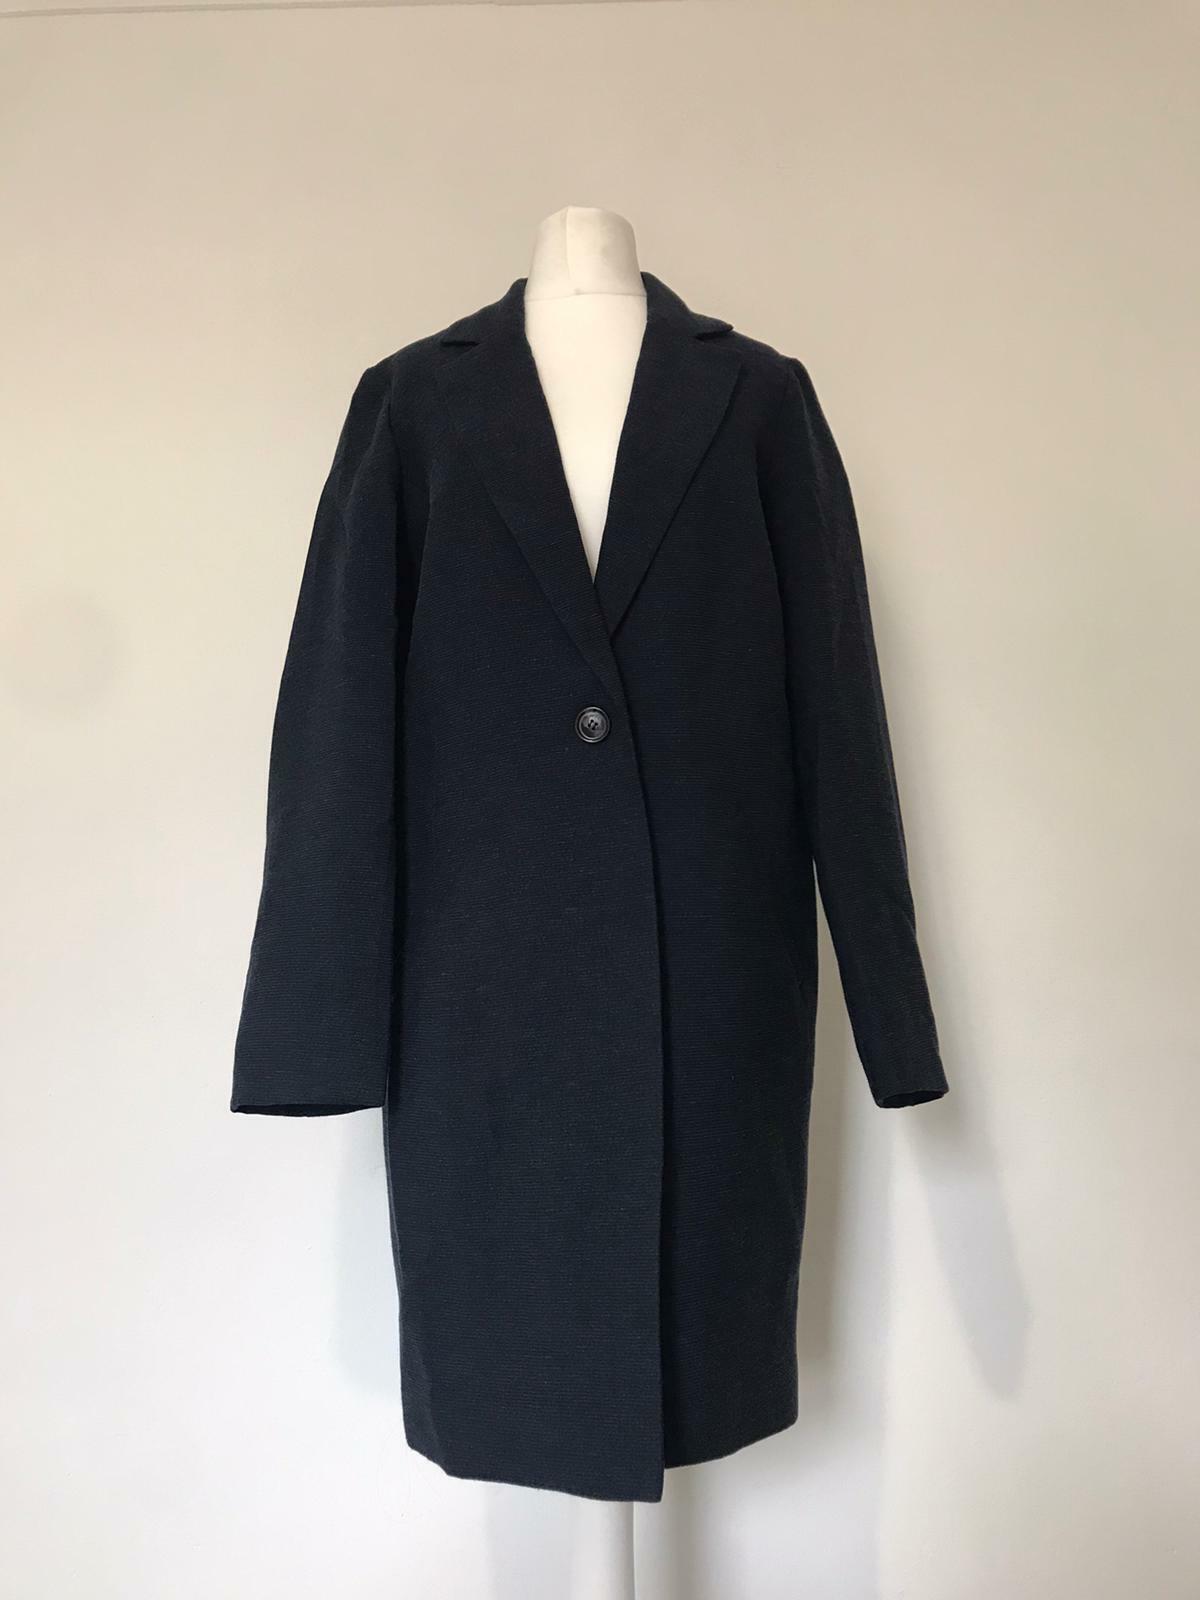 Mint Velvet Coat Size 6 Blue Relaxed Single Breasted Throw On Lightweight Coat